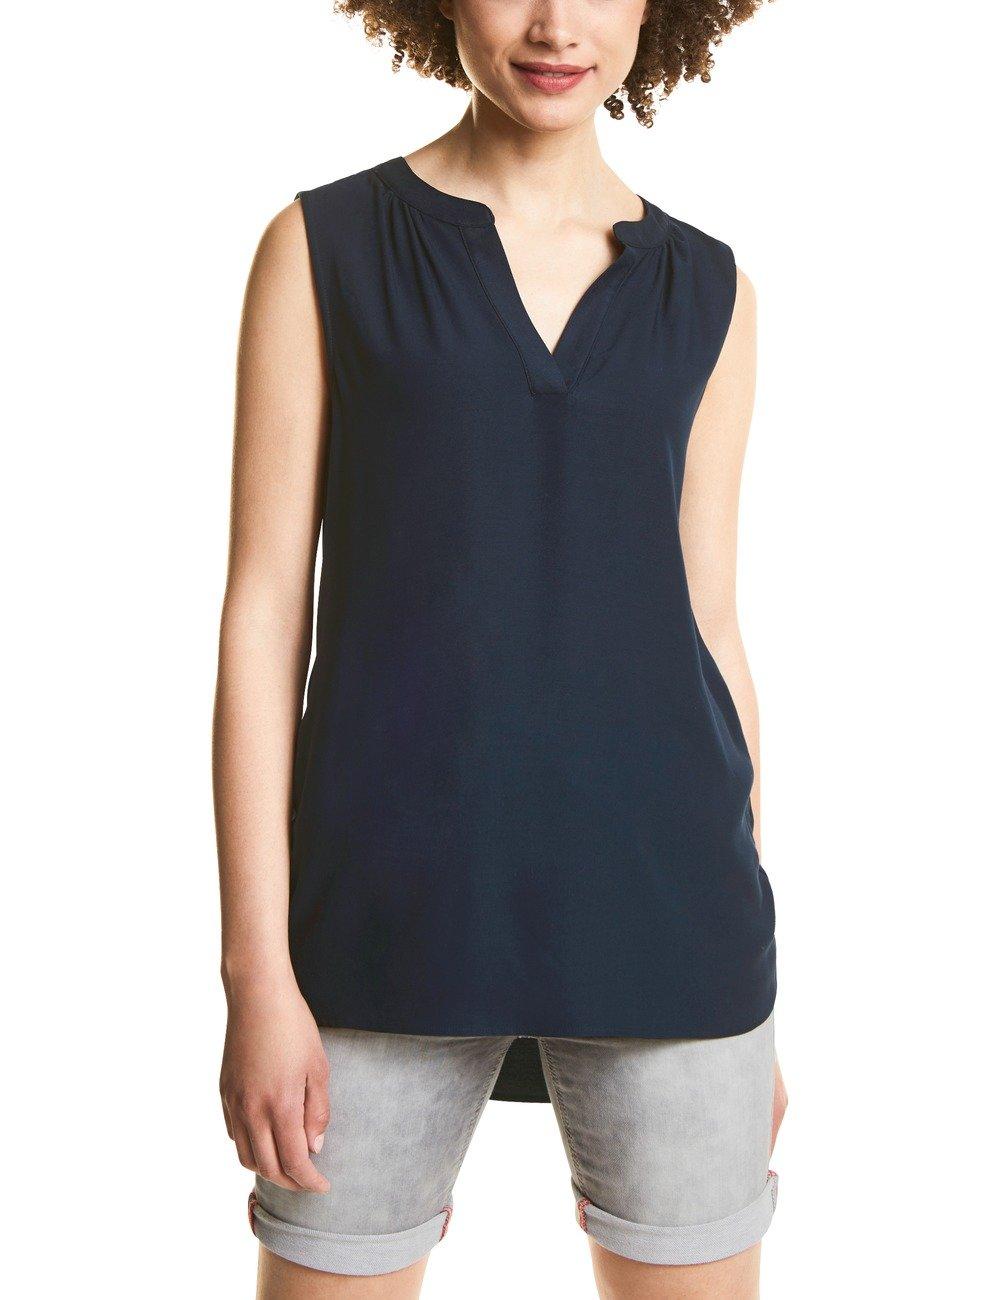 FemmeBleudeep Street One 340905Blouse Blue 1123840 bf76gy